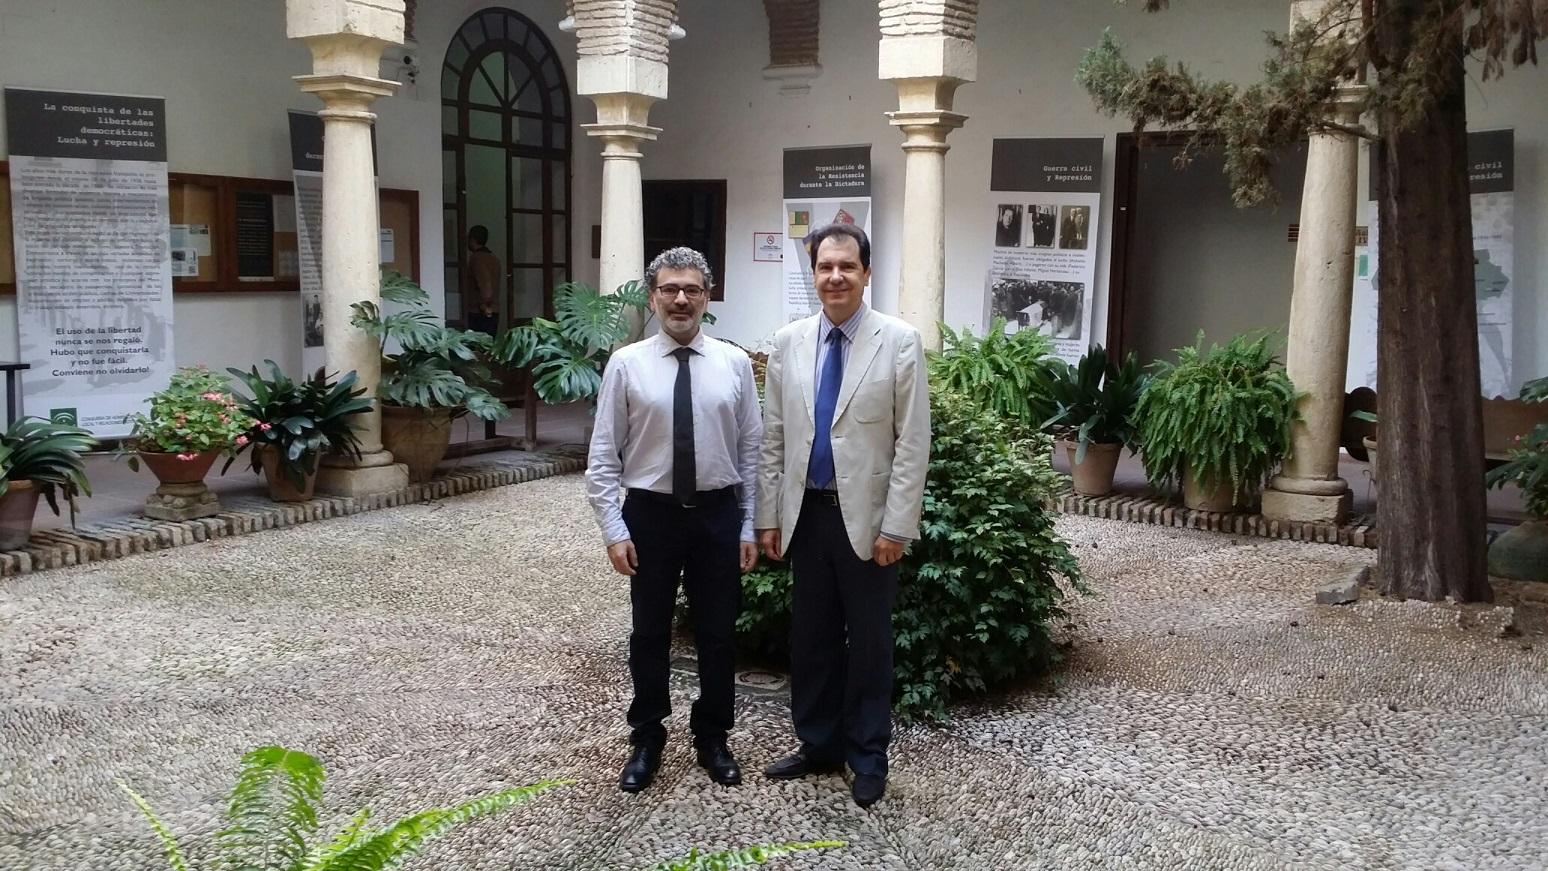 Gabriele Rossetti e Juan Carlos Martinez Ortega